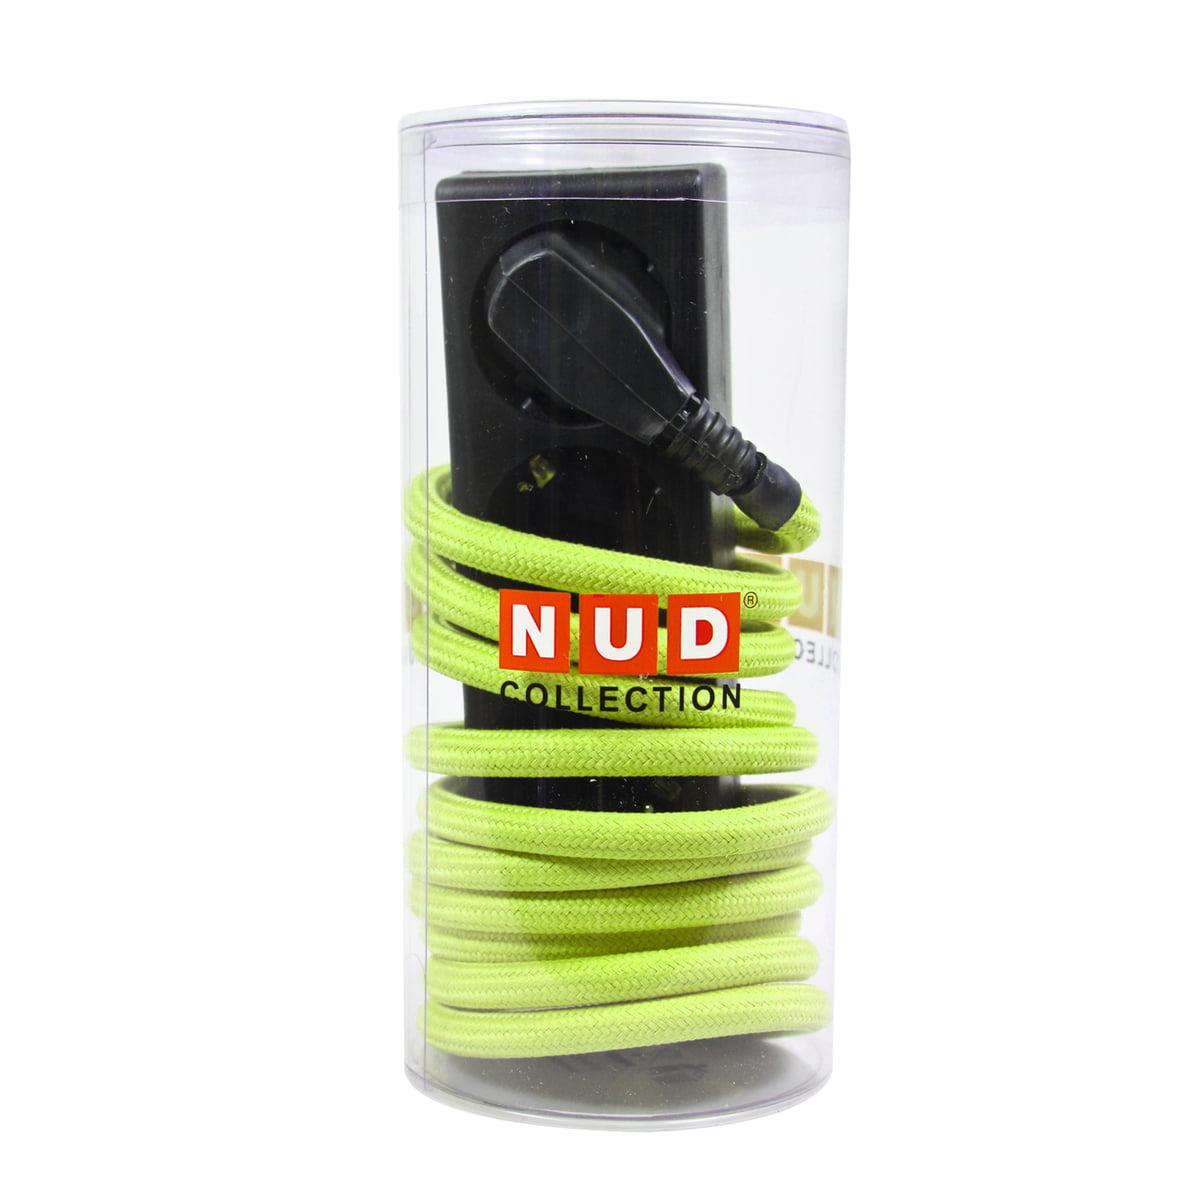 NUD Collection - Extension Cord 3fach-Steckdose, Celery Green (TT-44) | Baumarkt > Elektroinstallation | Grün | Kabel mit textilummantelung | NUD Collection